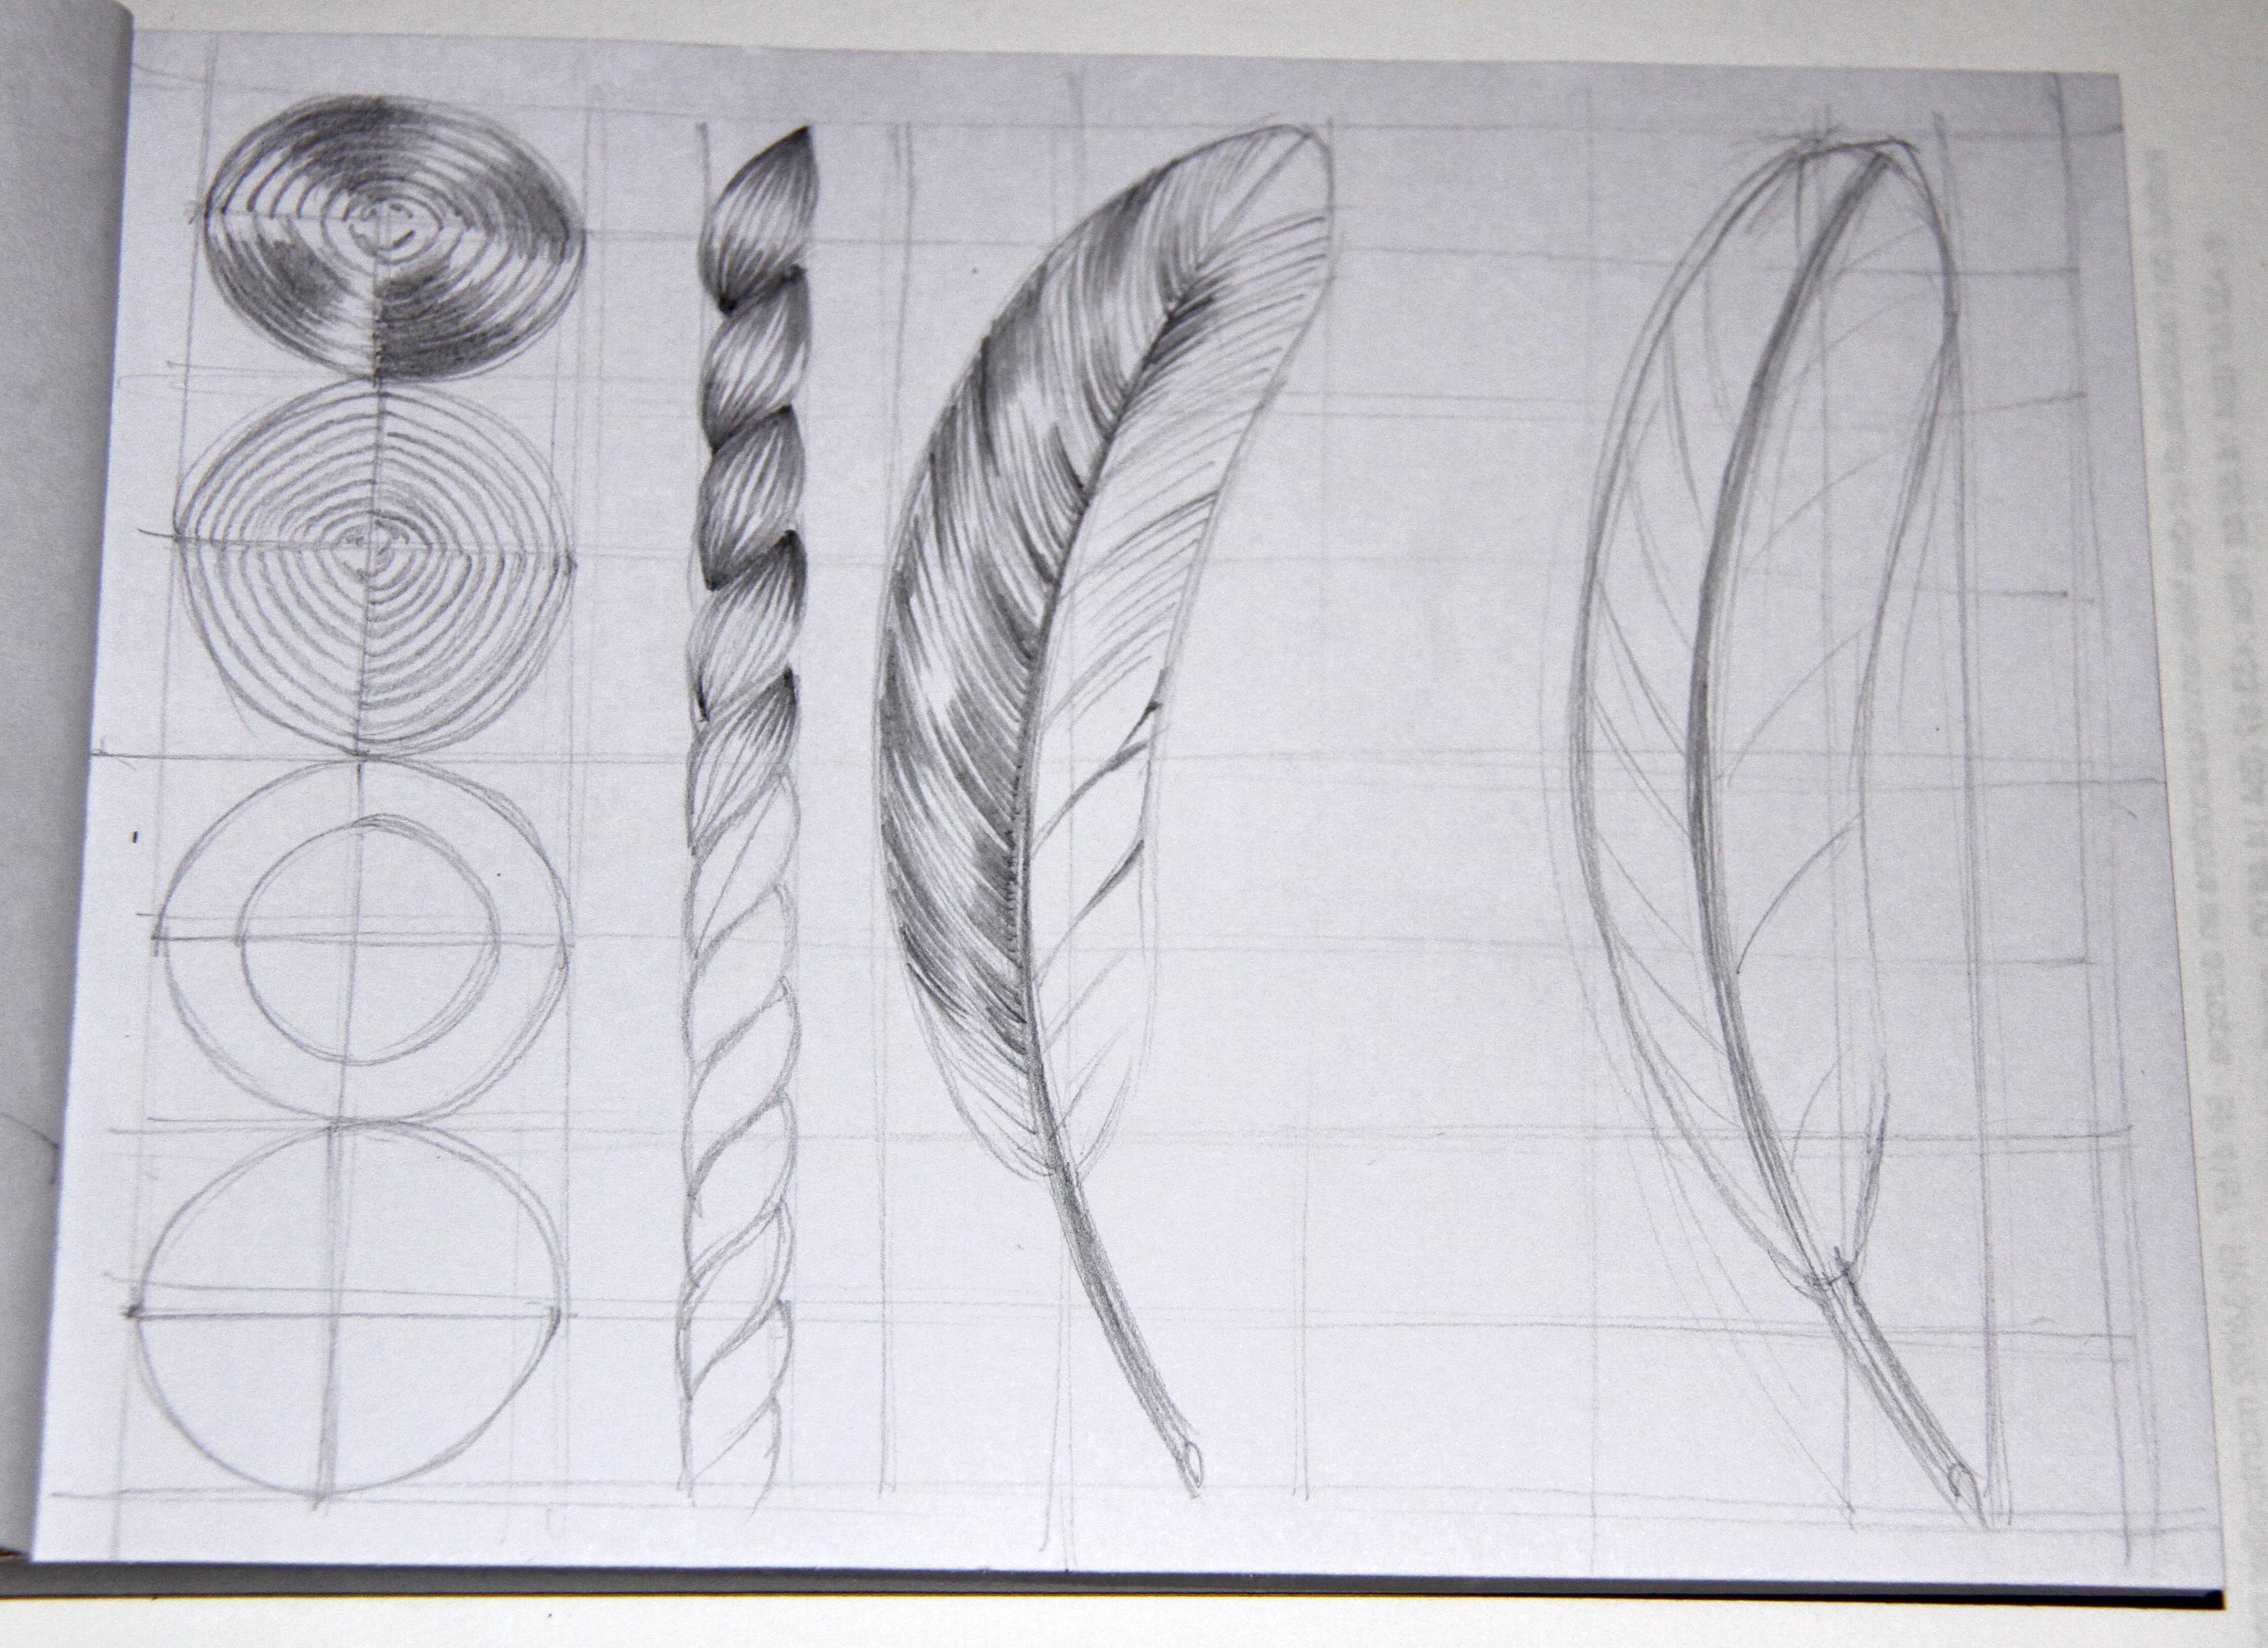 Free Images Wing Line Material Circle Artwork Sketch Drawing